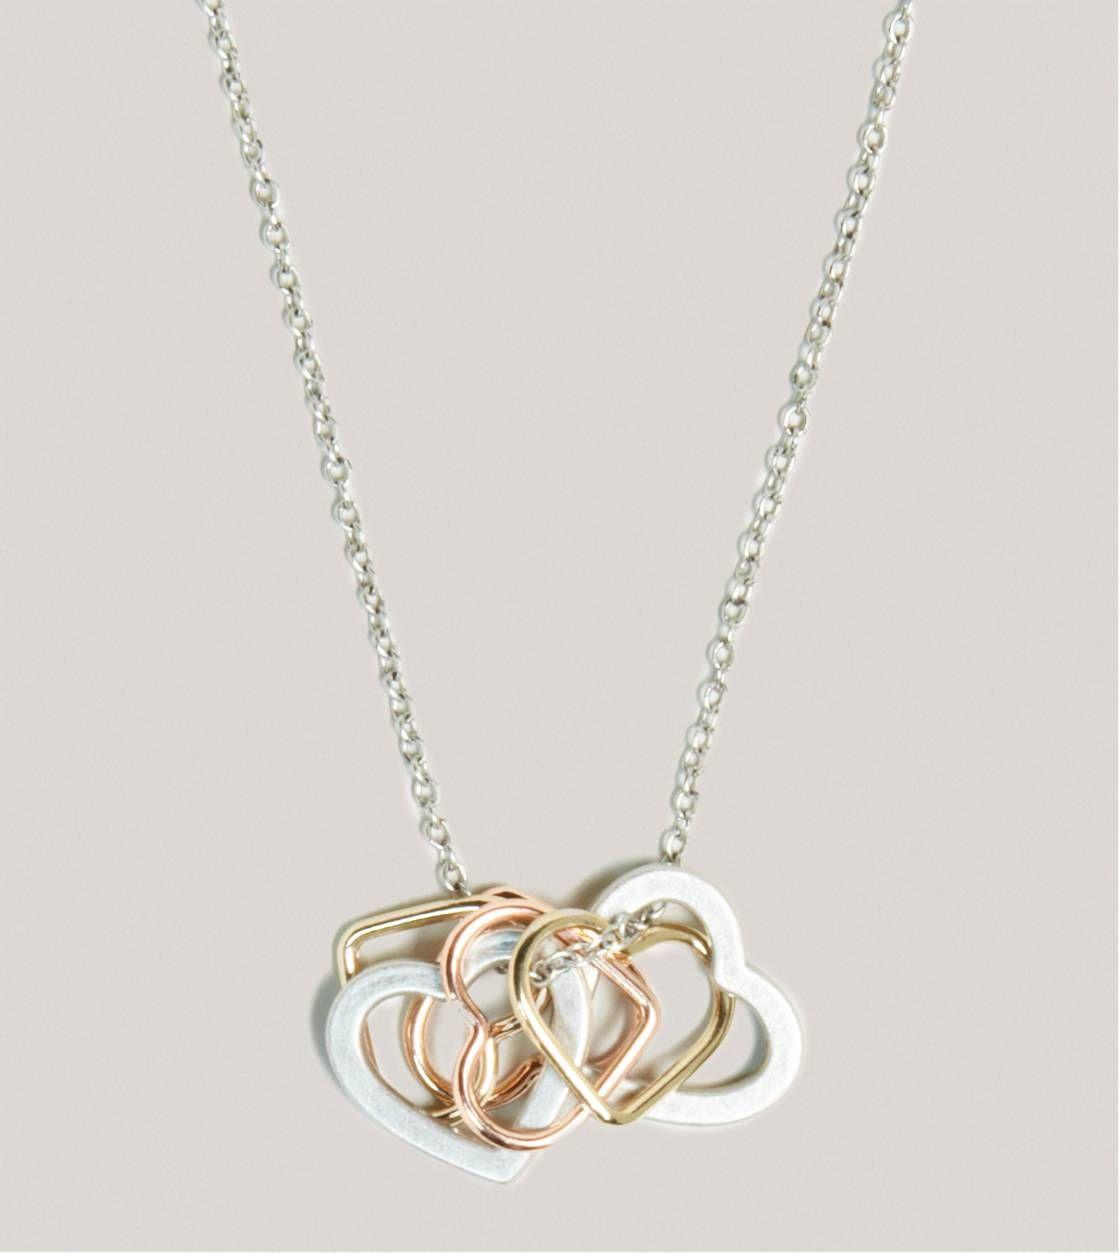 Heart ring necklace jewelry is my best friend pinterest aeo